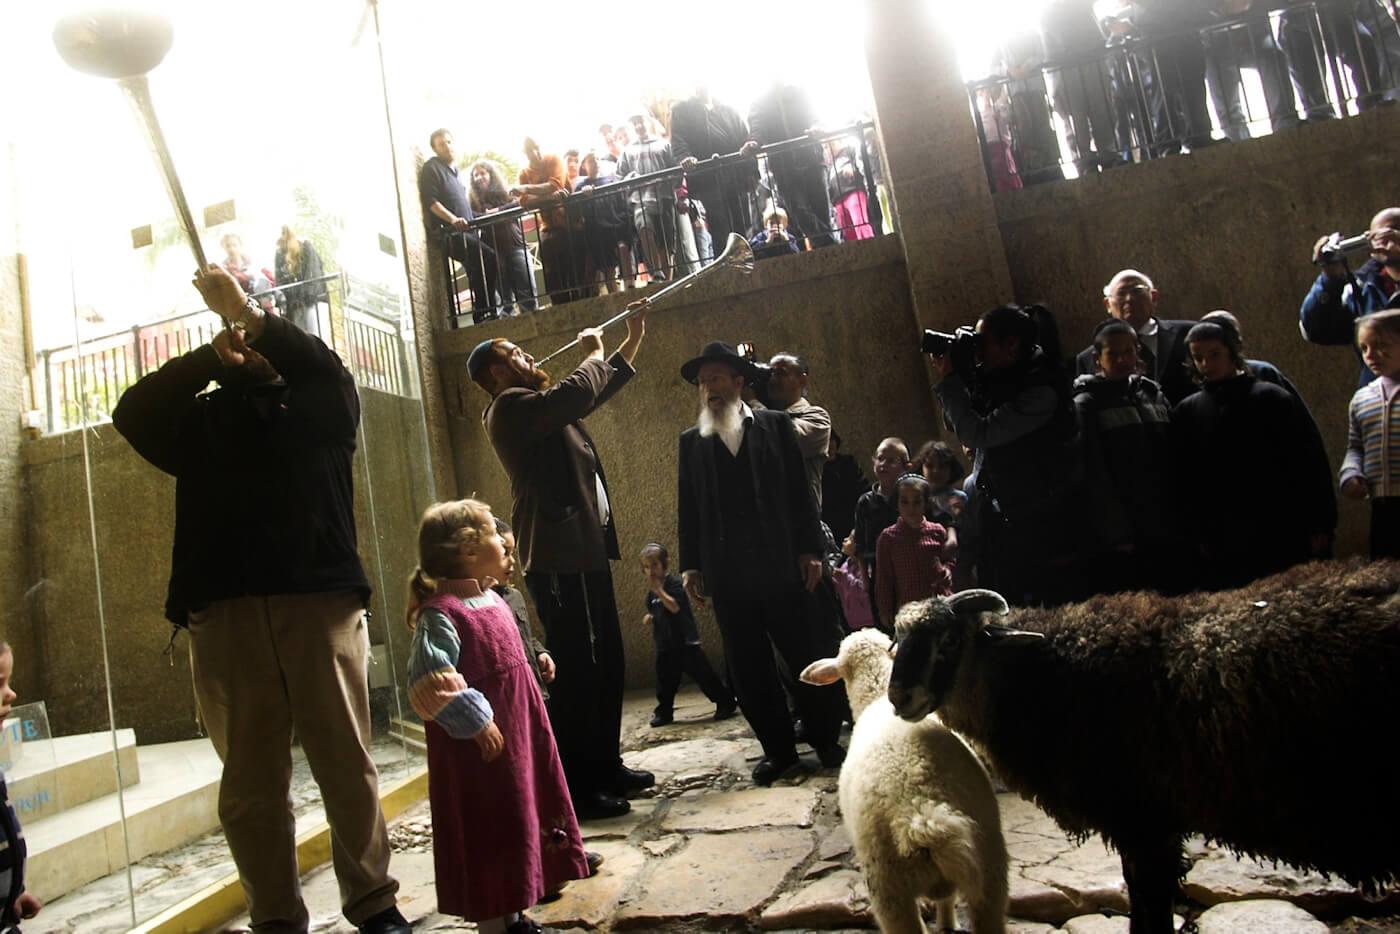 Yisrael Ariel oversees a Temple Mount Faithful enactment of rituals for a rebuilt Third Temple. Tomer Appelbaum | Haaretz